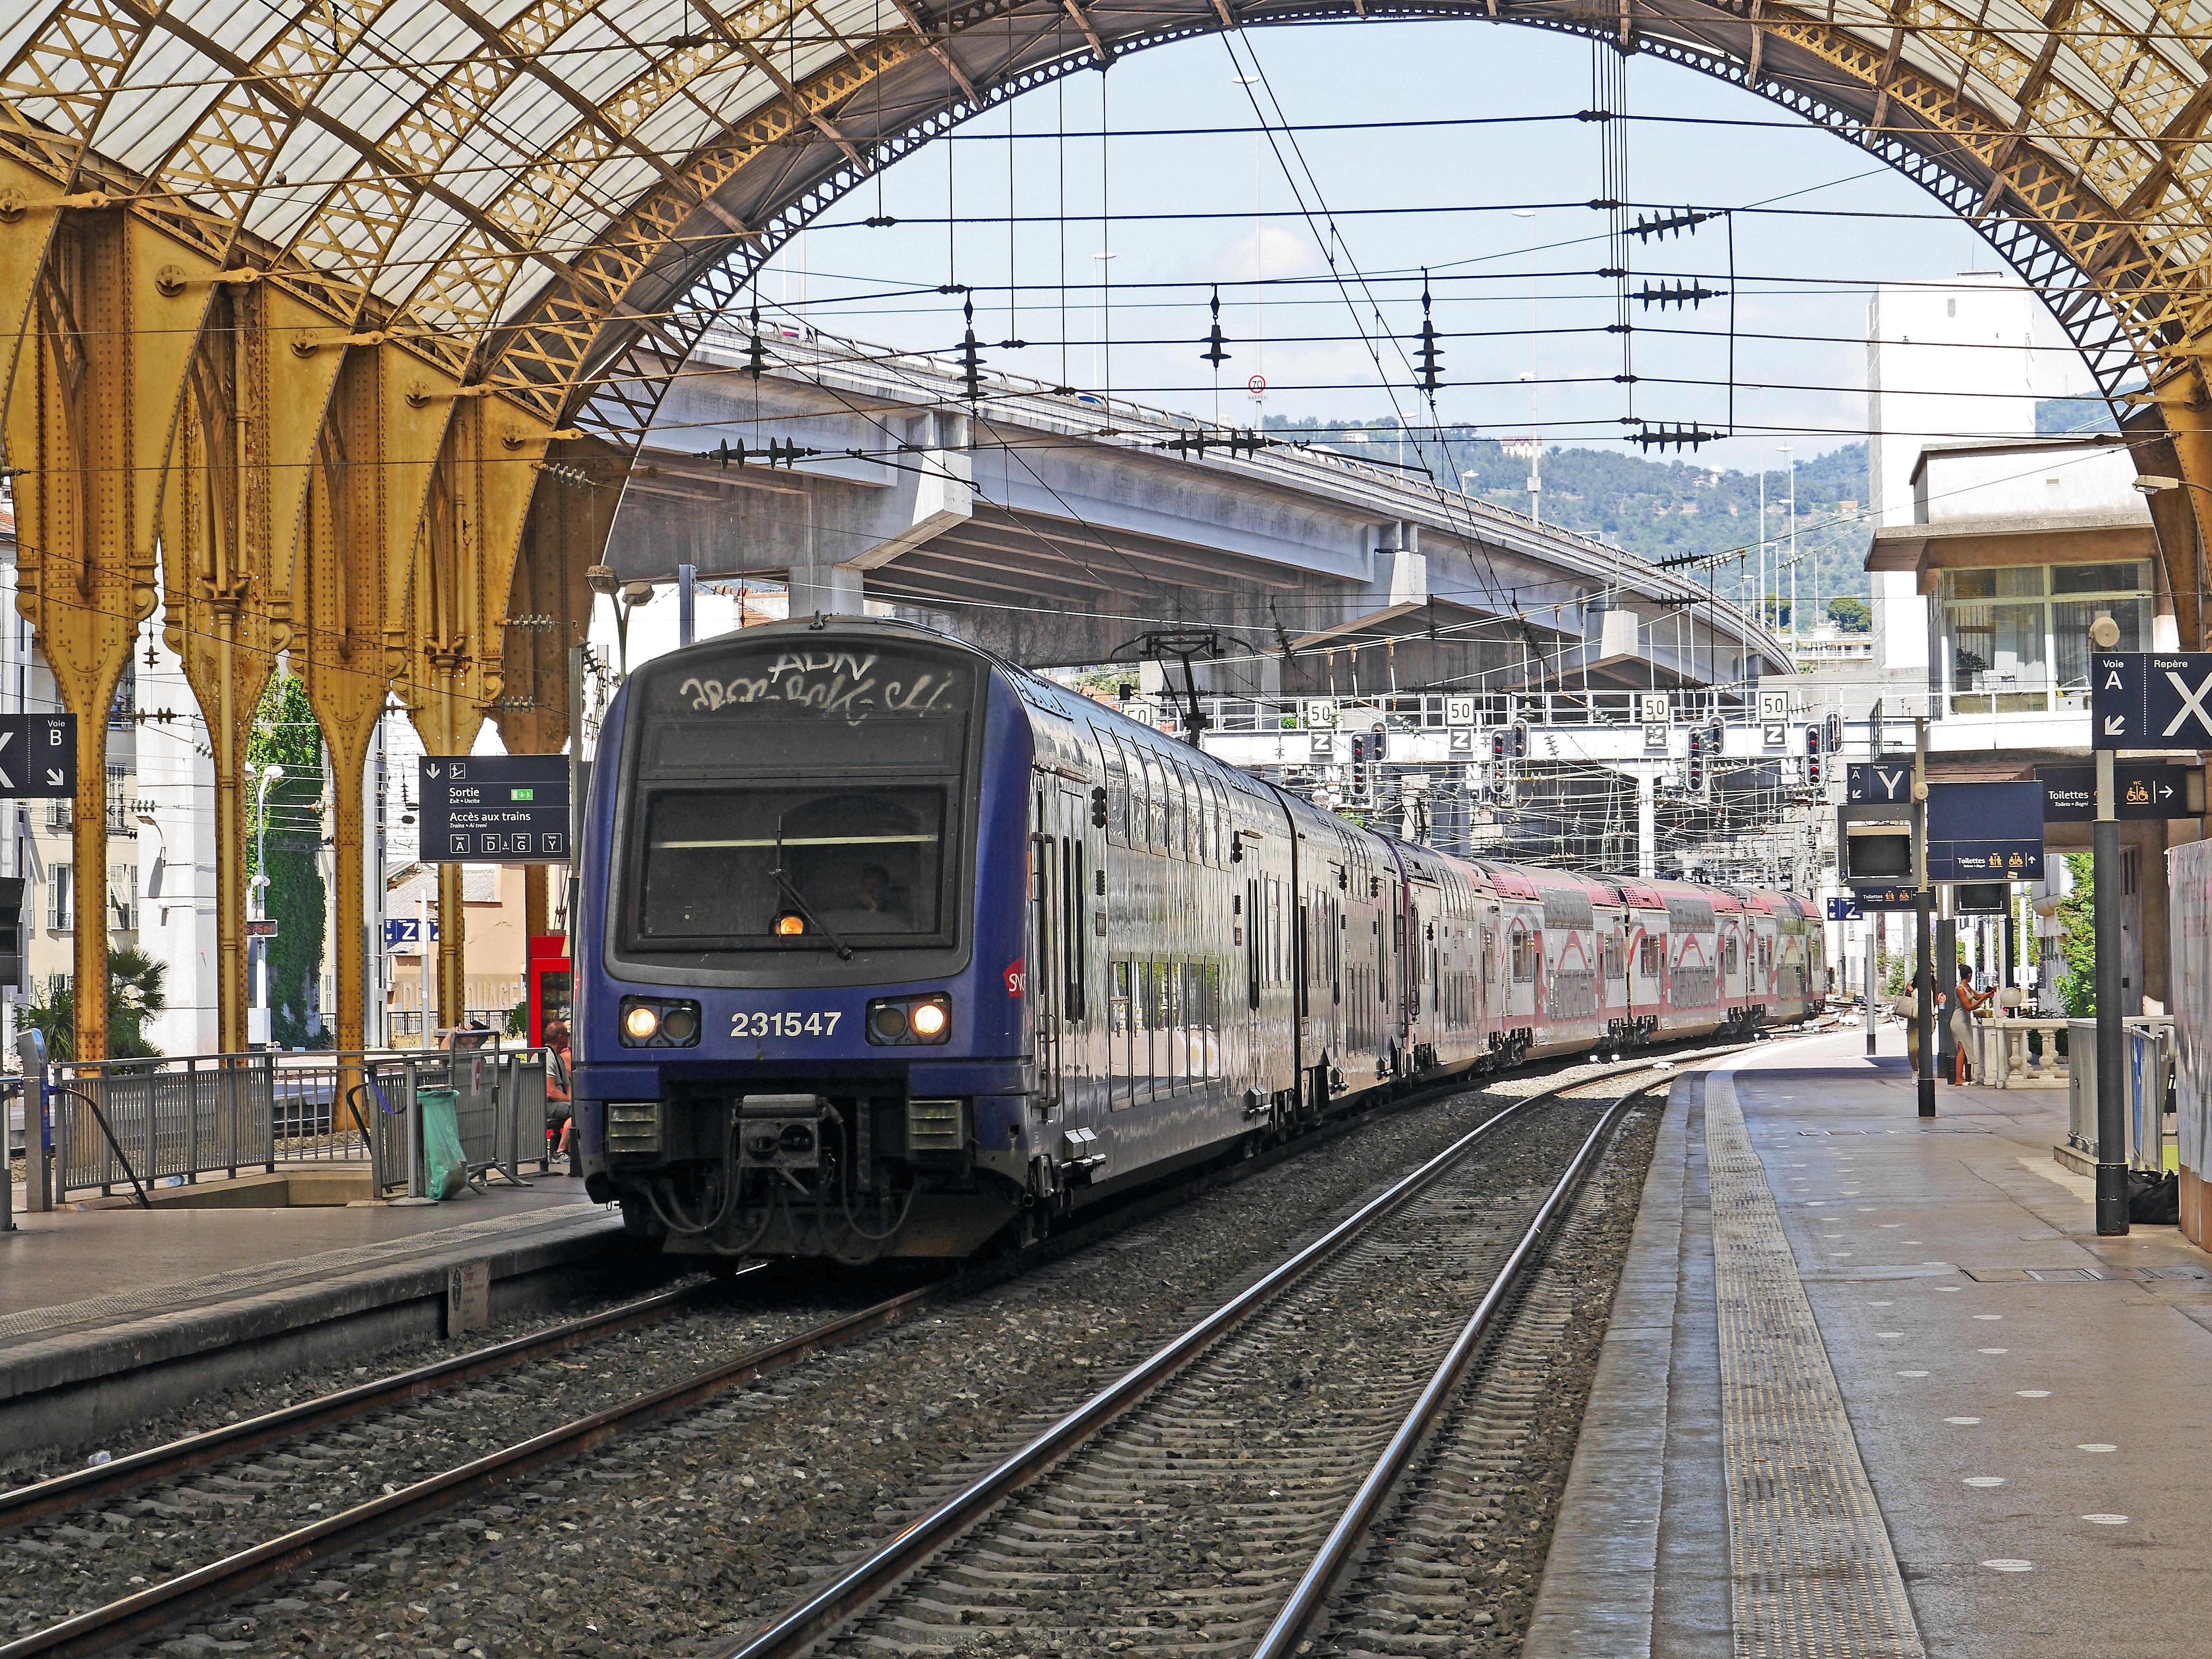 Bildet Spor Jernbane Stal Transportere Frankrike